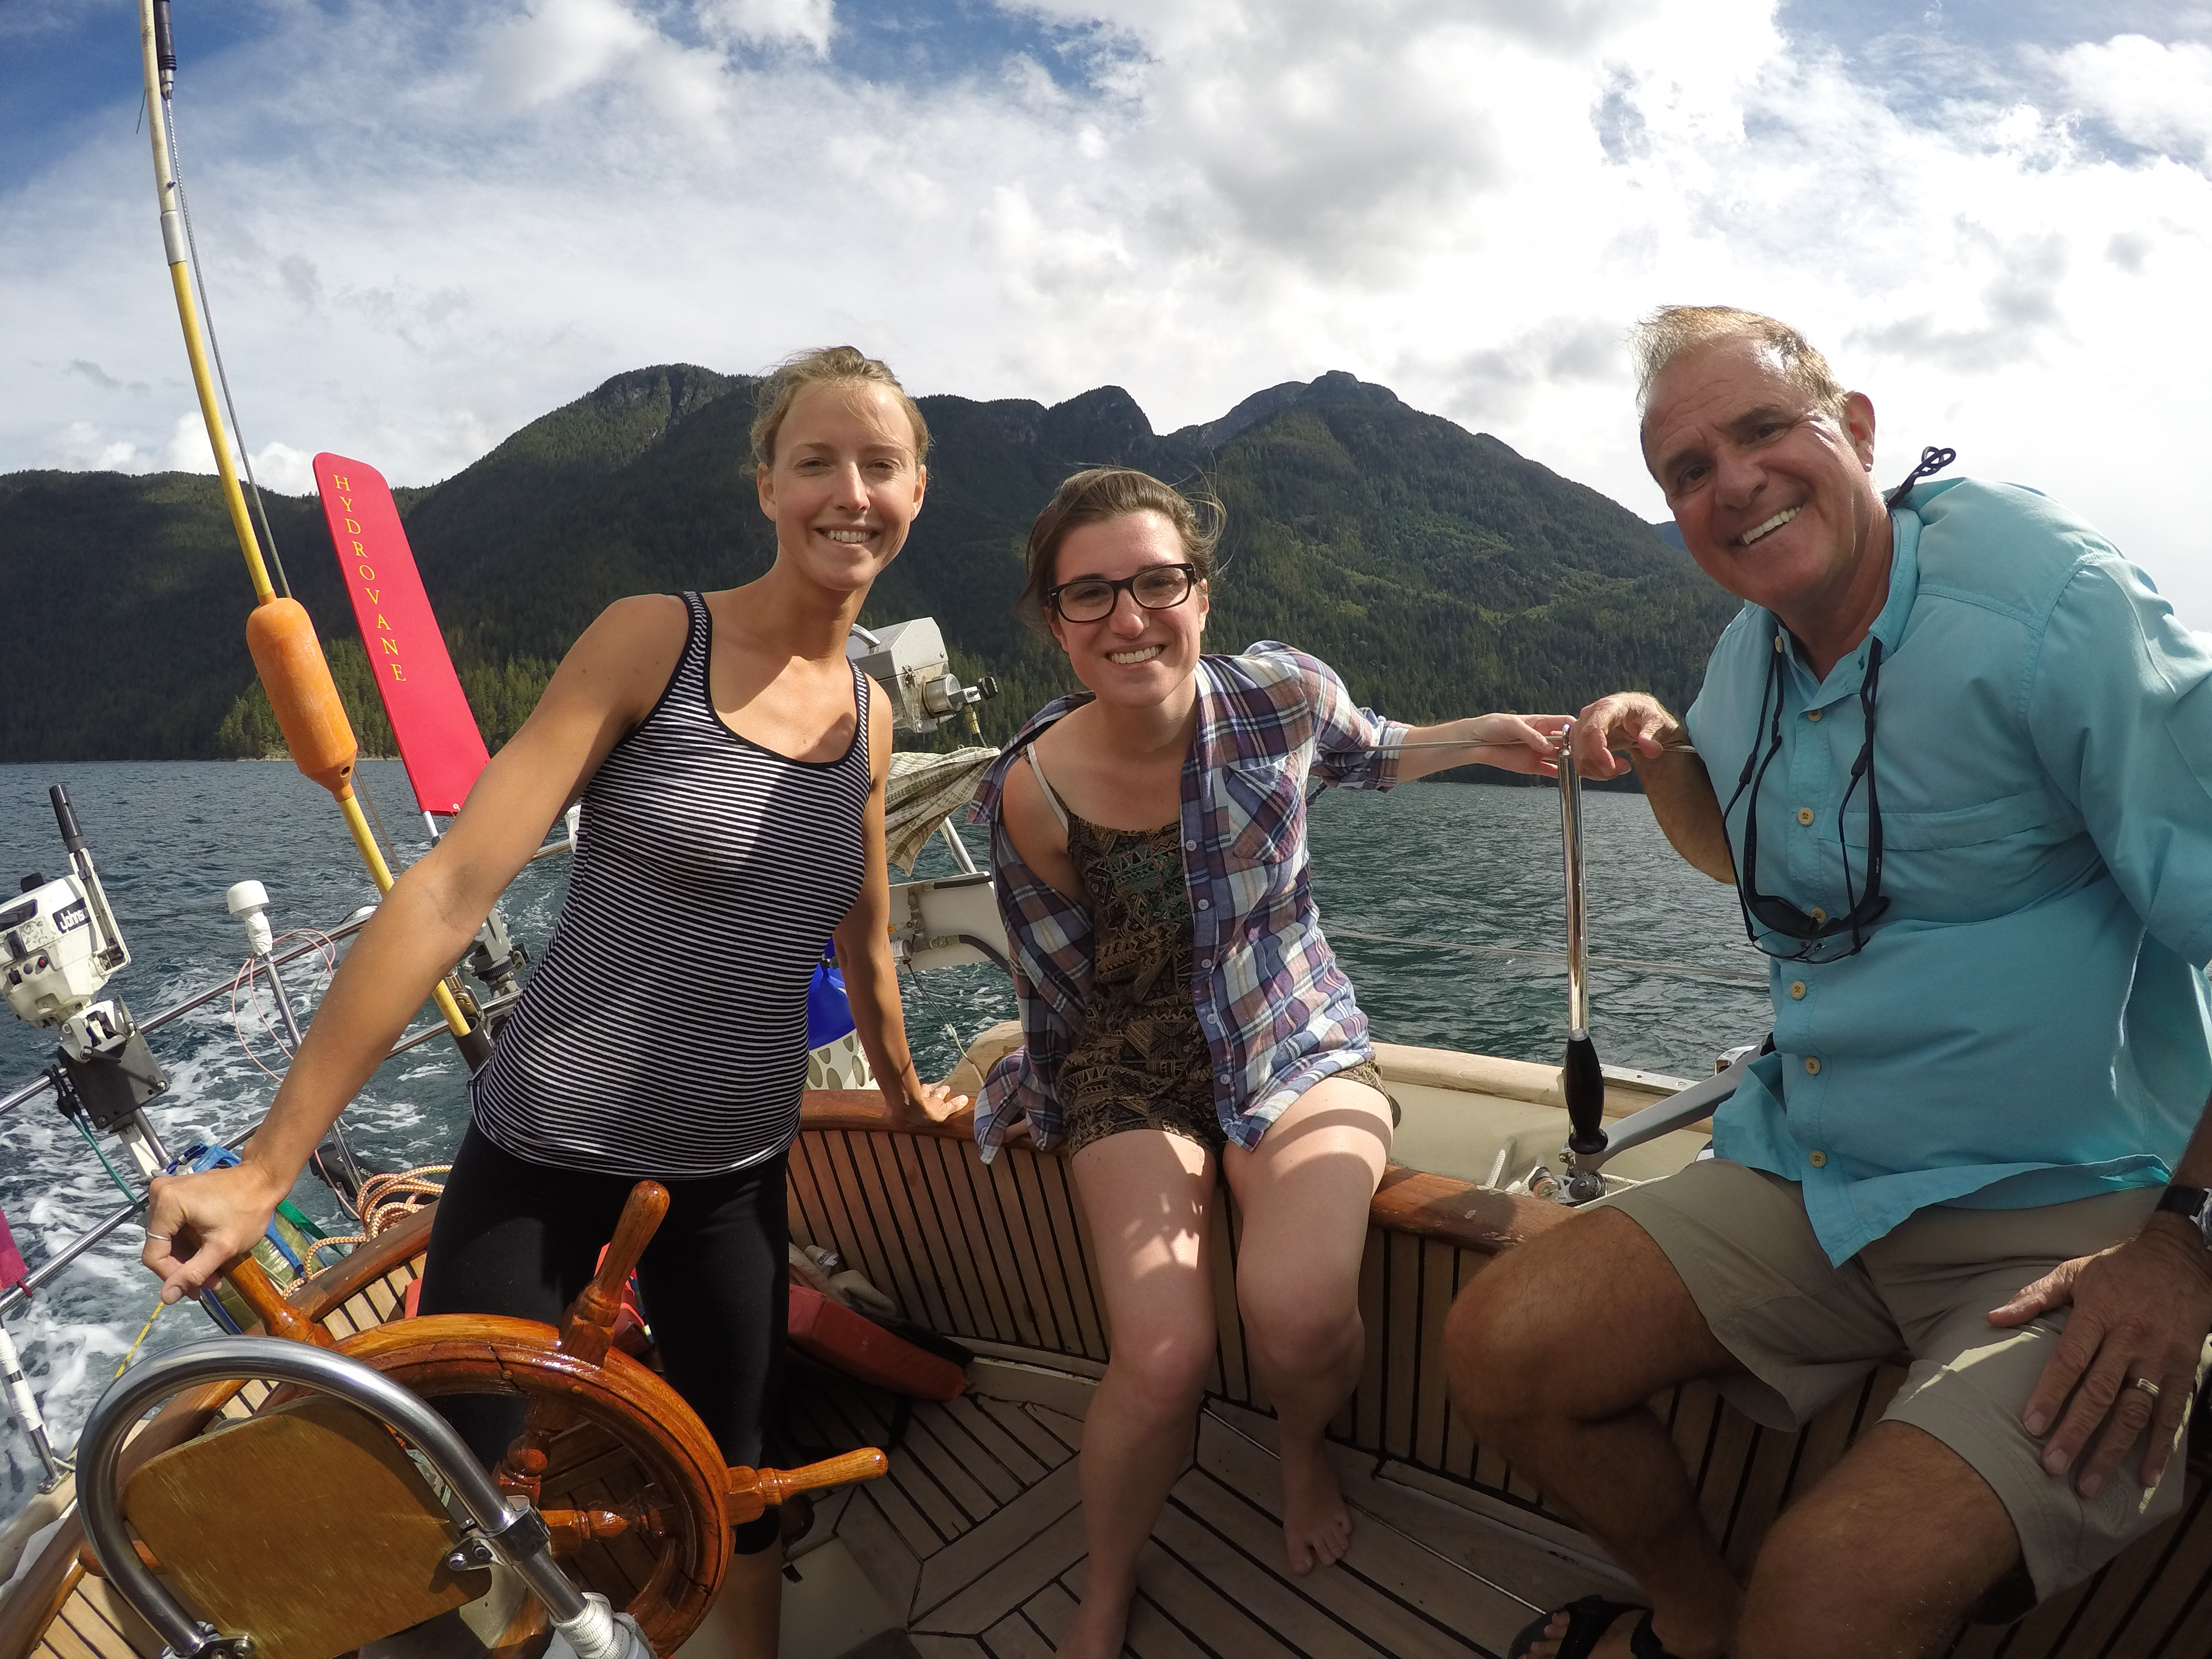 Saxony, Tamara, Roger sailing Leela in Desolation Sound